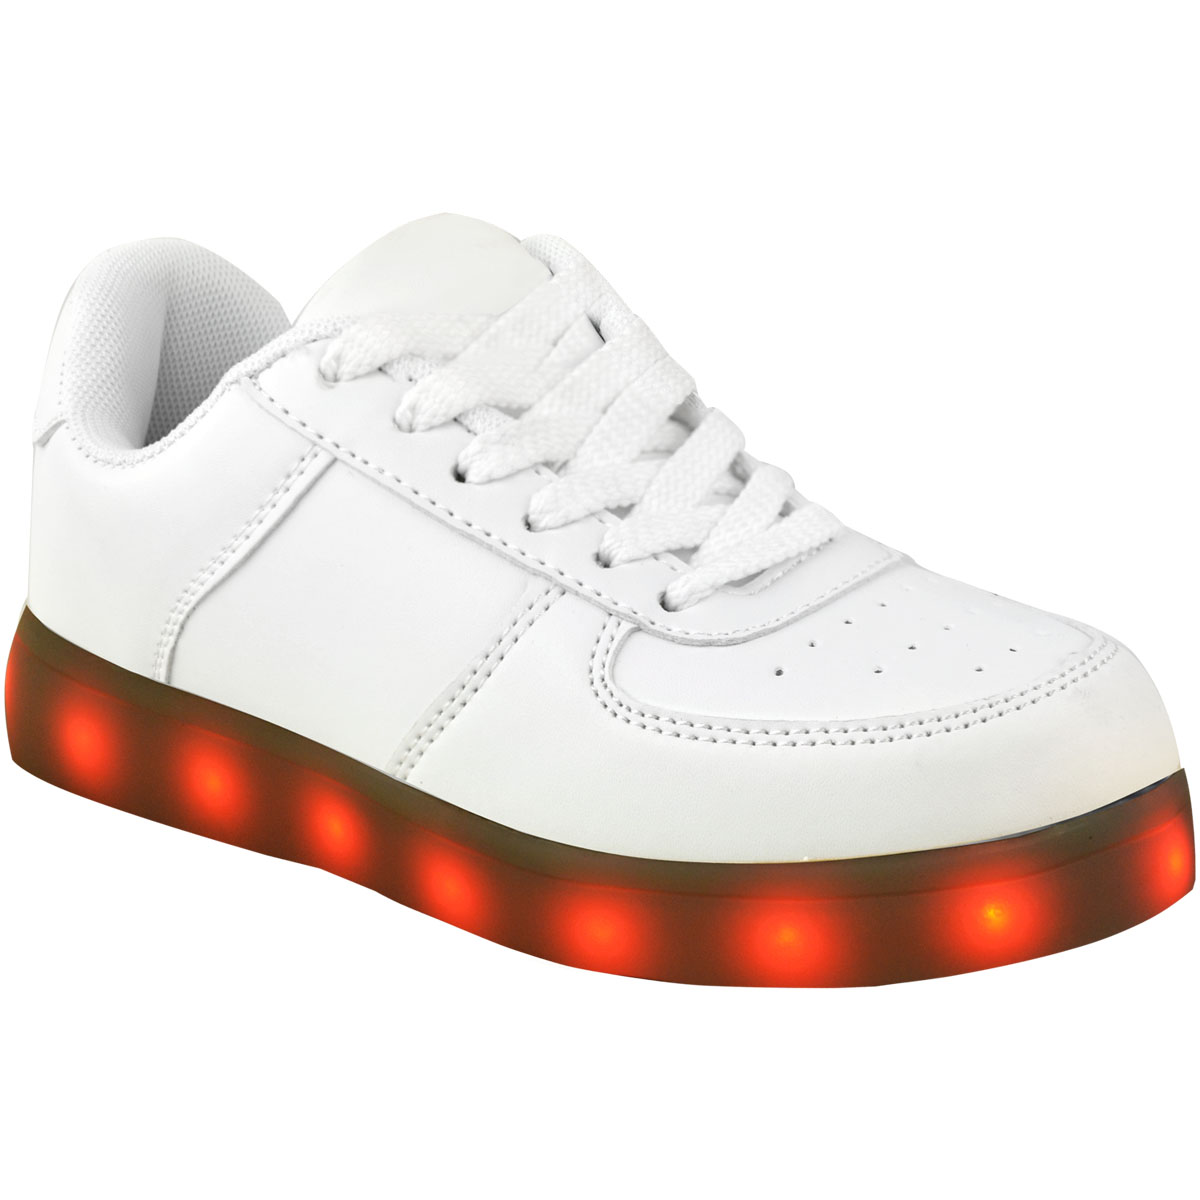 Bambini Ragazzi Ragazze LED Light Up Scarpe da ginnastica bianco USB CARICA Scarpe da ginnastica Pompe Scarpe Misura